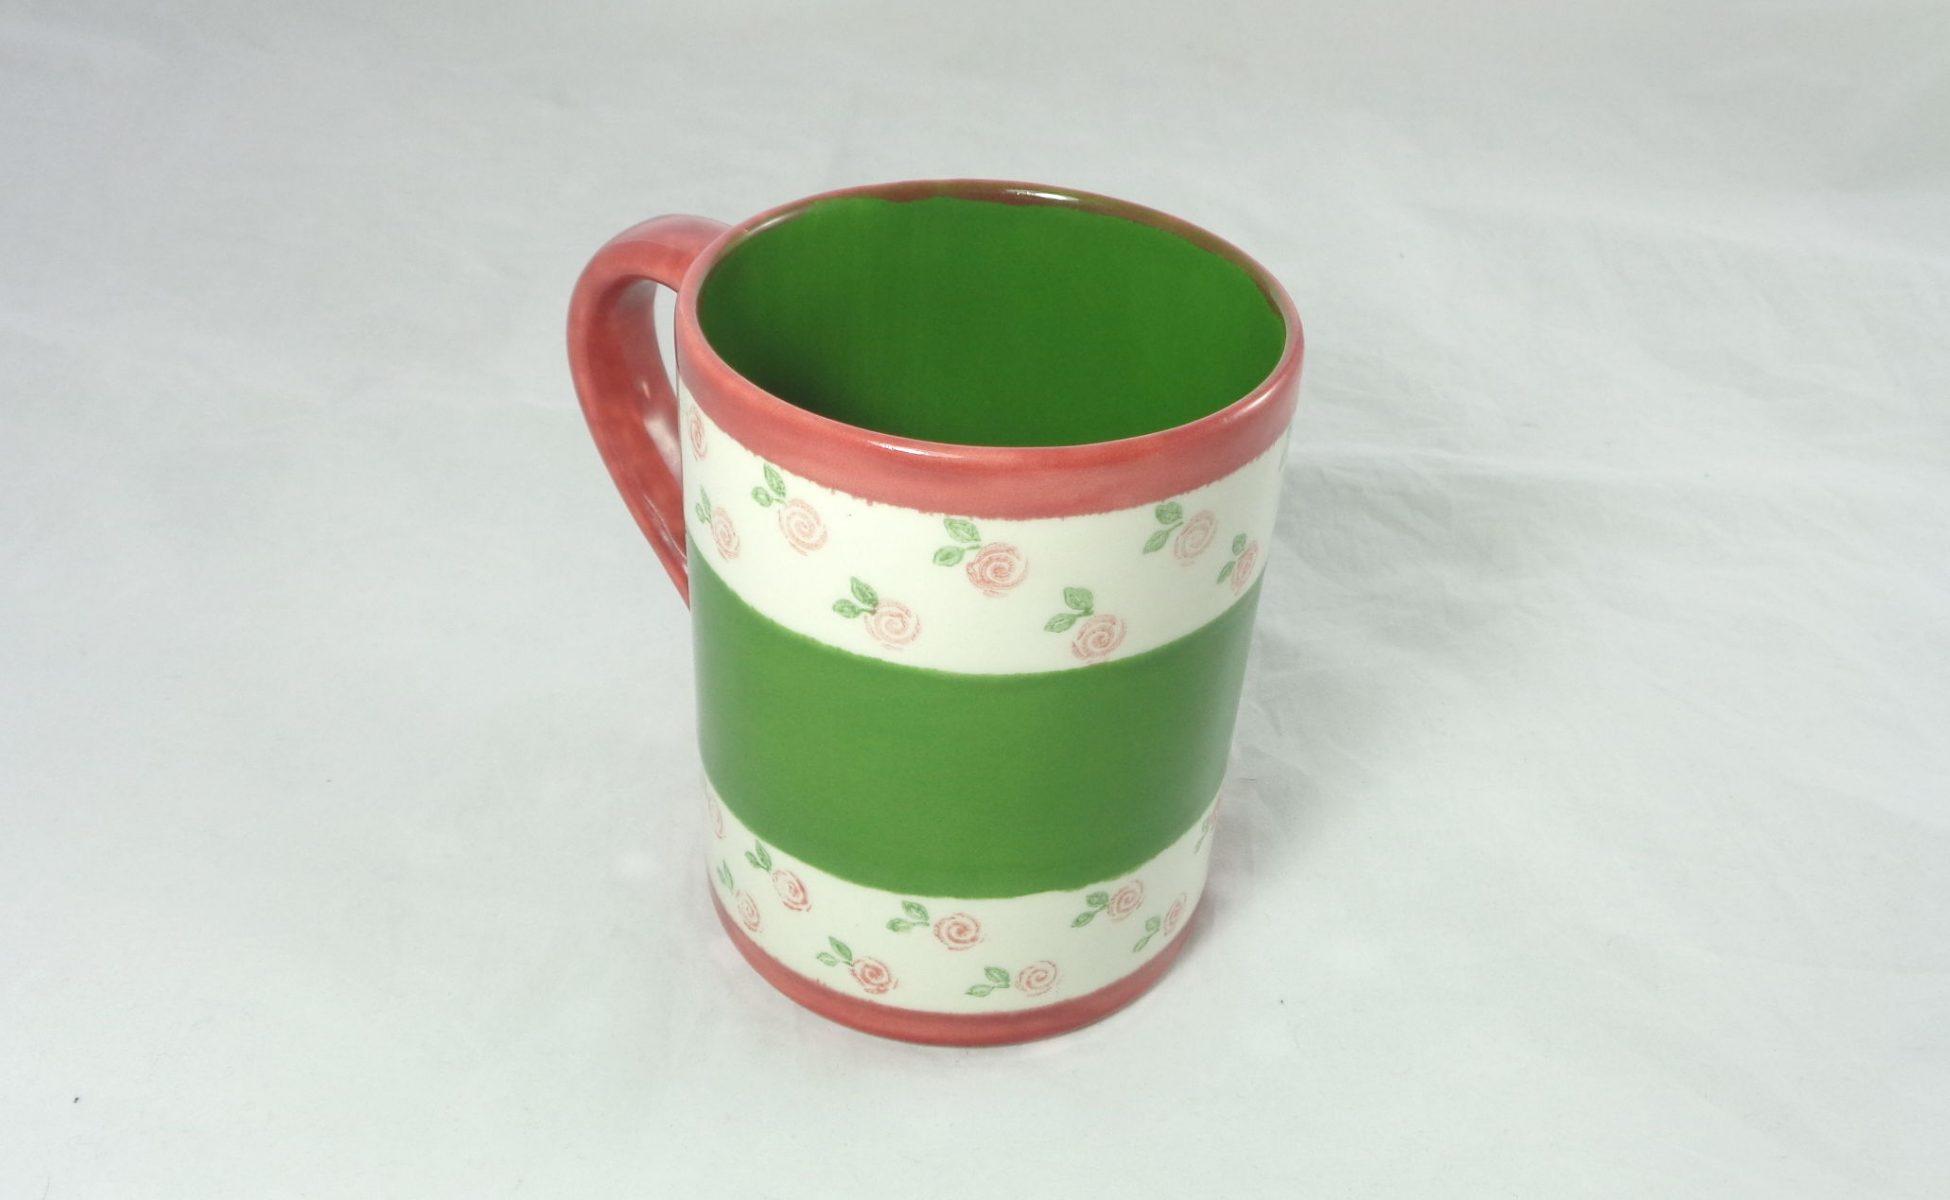 Bemalte Keramik Kaffeebecher Rosen